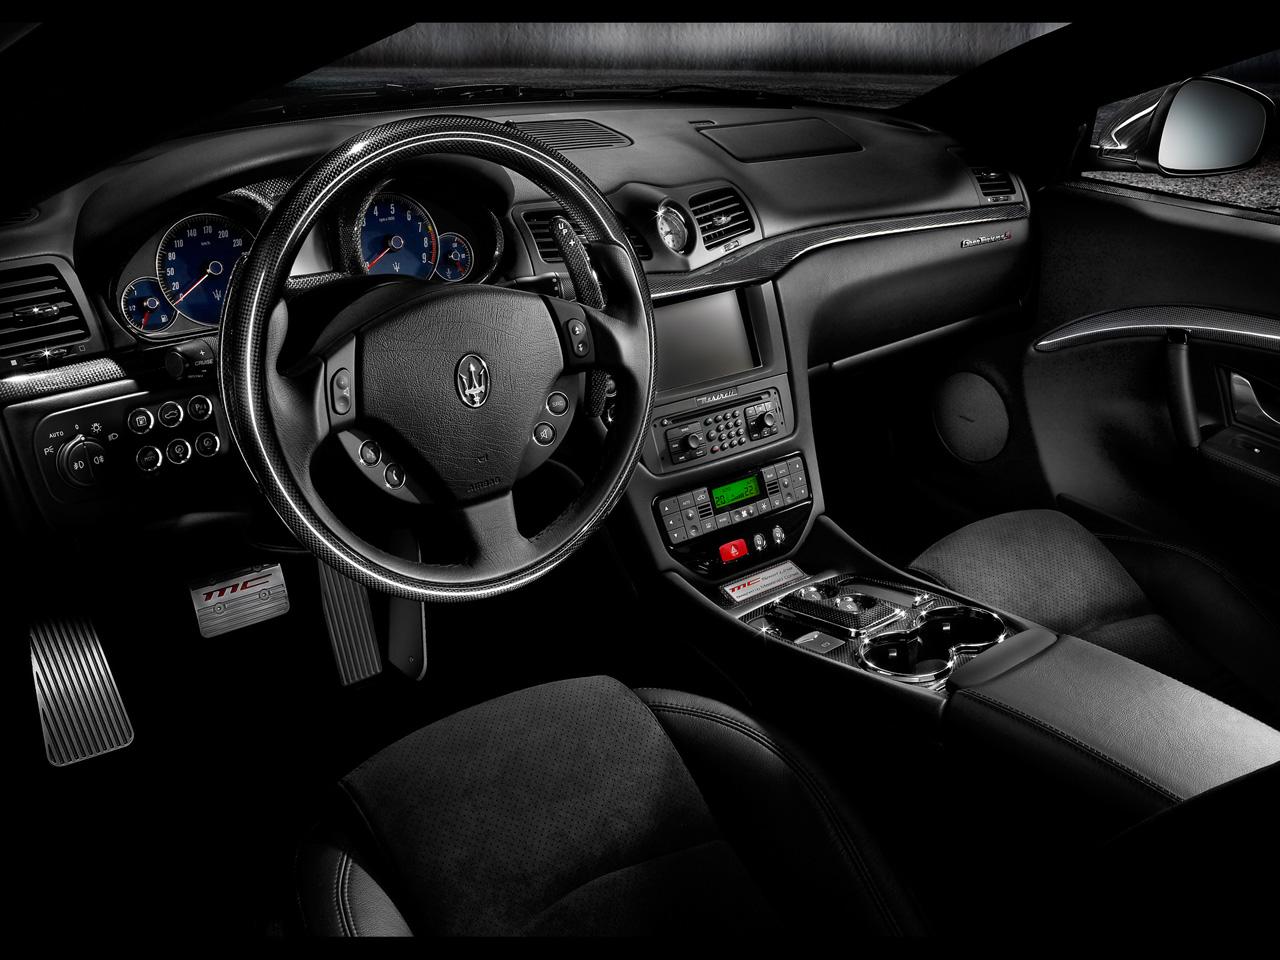 Maserati granturismo review and photos - Maserati granturismo red interior ...